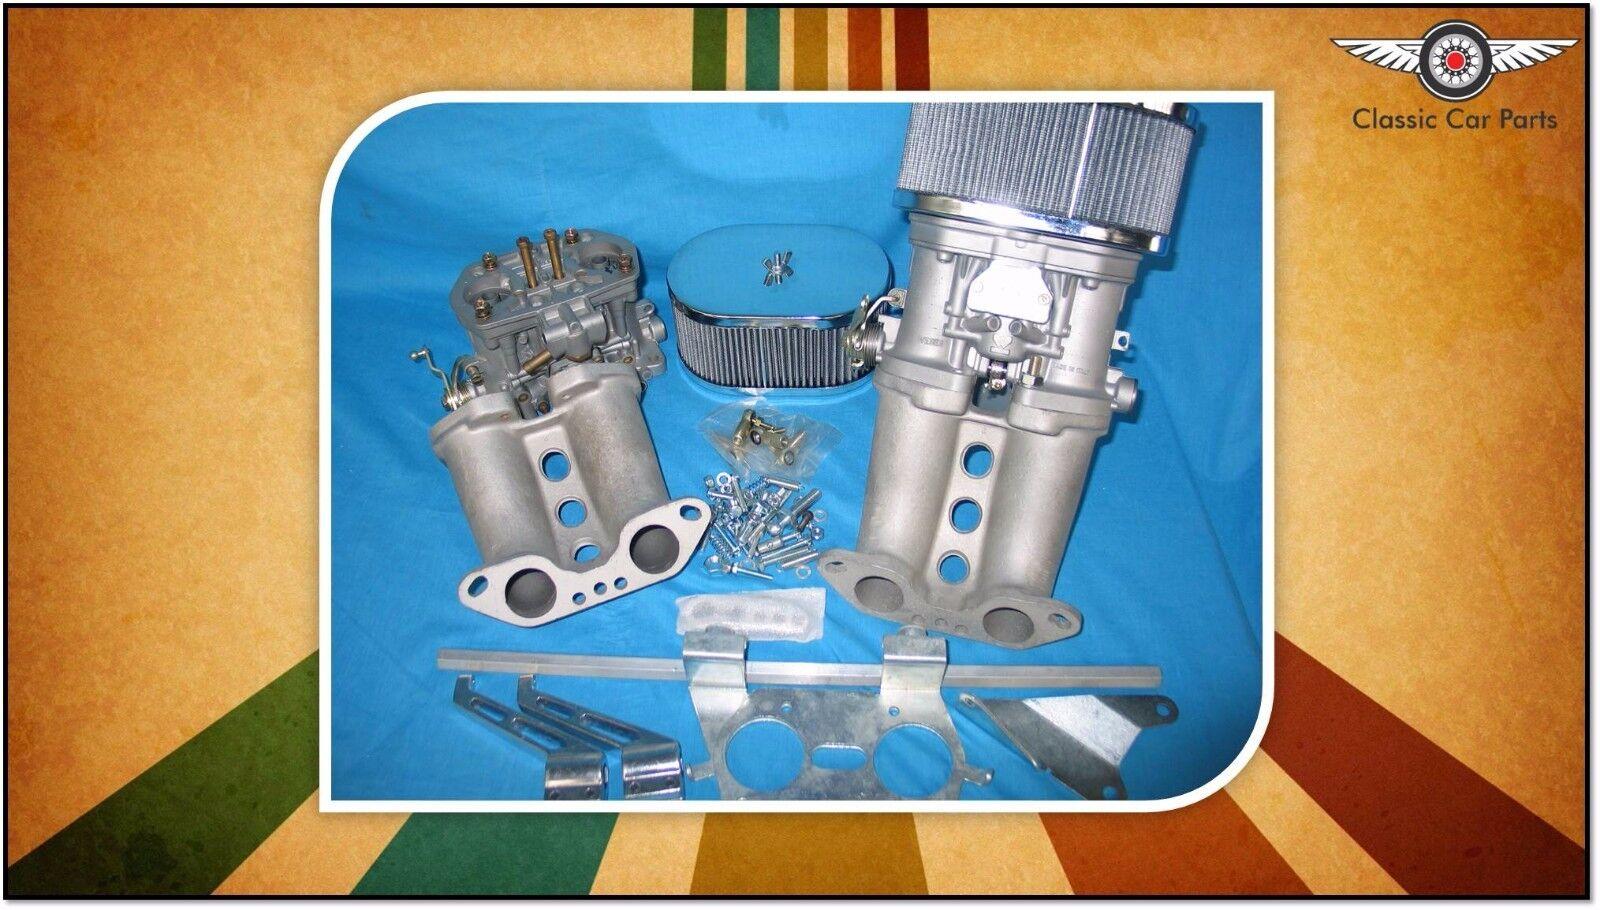 Details about Kombi, VW type 2 Twin Port Engines- Twin FAJS 40 IDF (Weber  Copy) Carburetor Kit